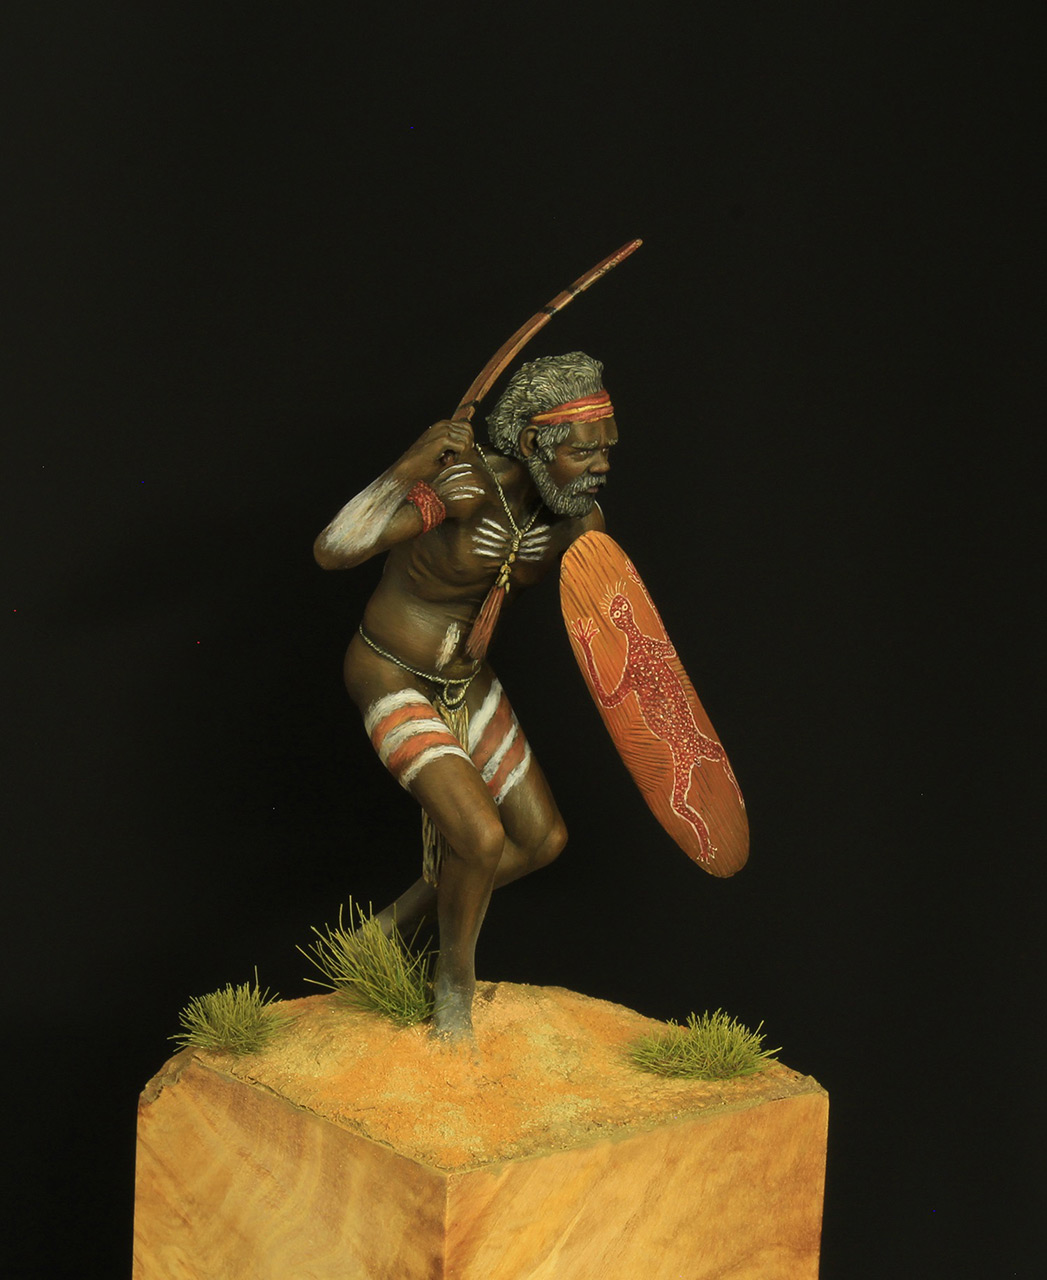 Figures: Australian aborigine, photo #6